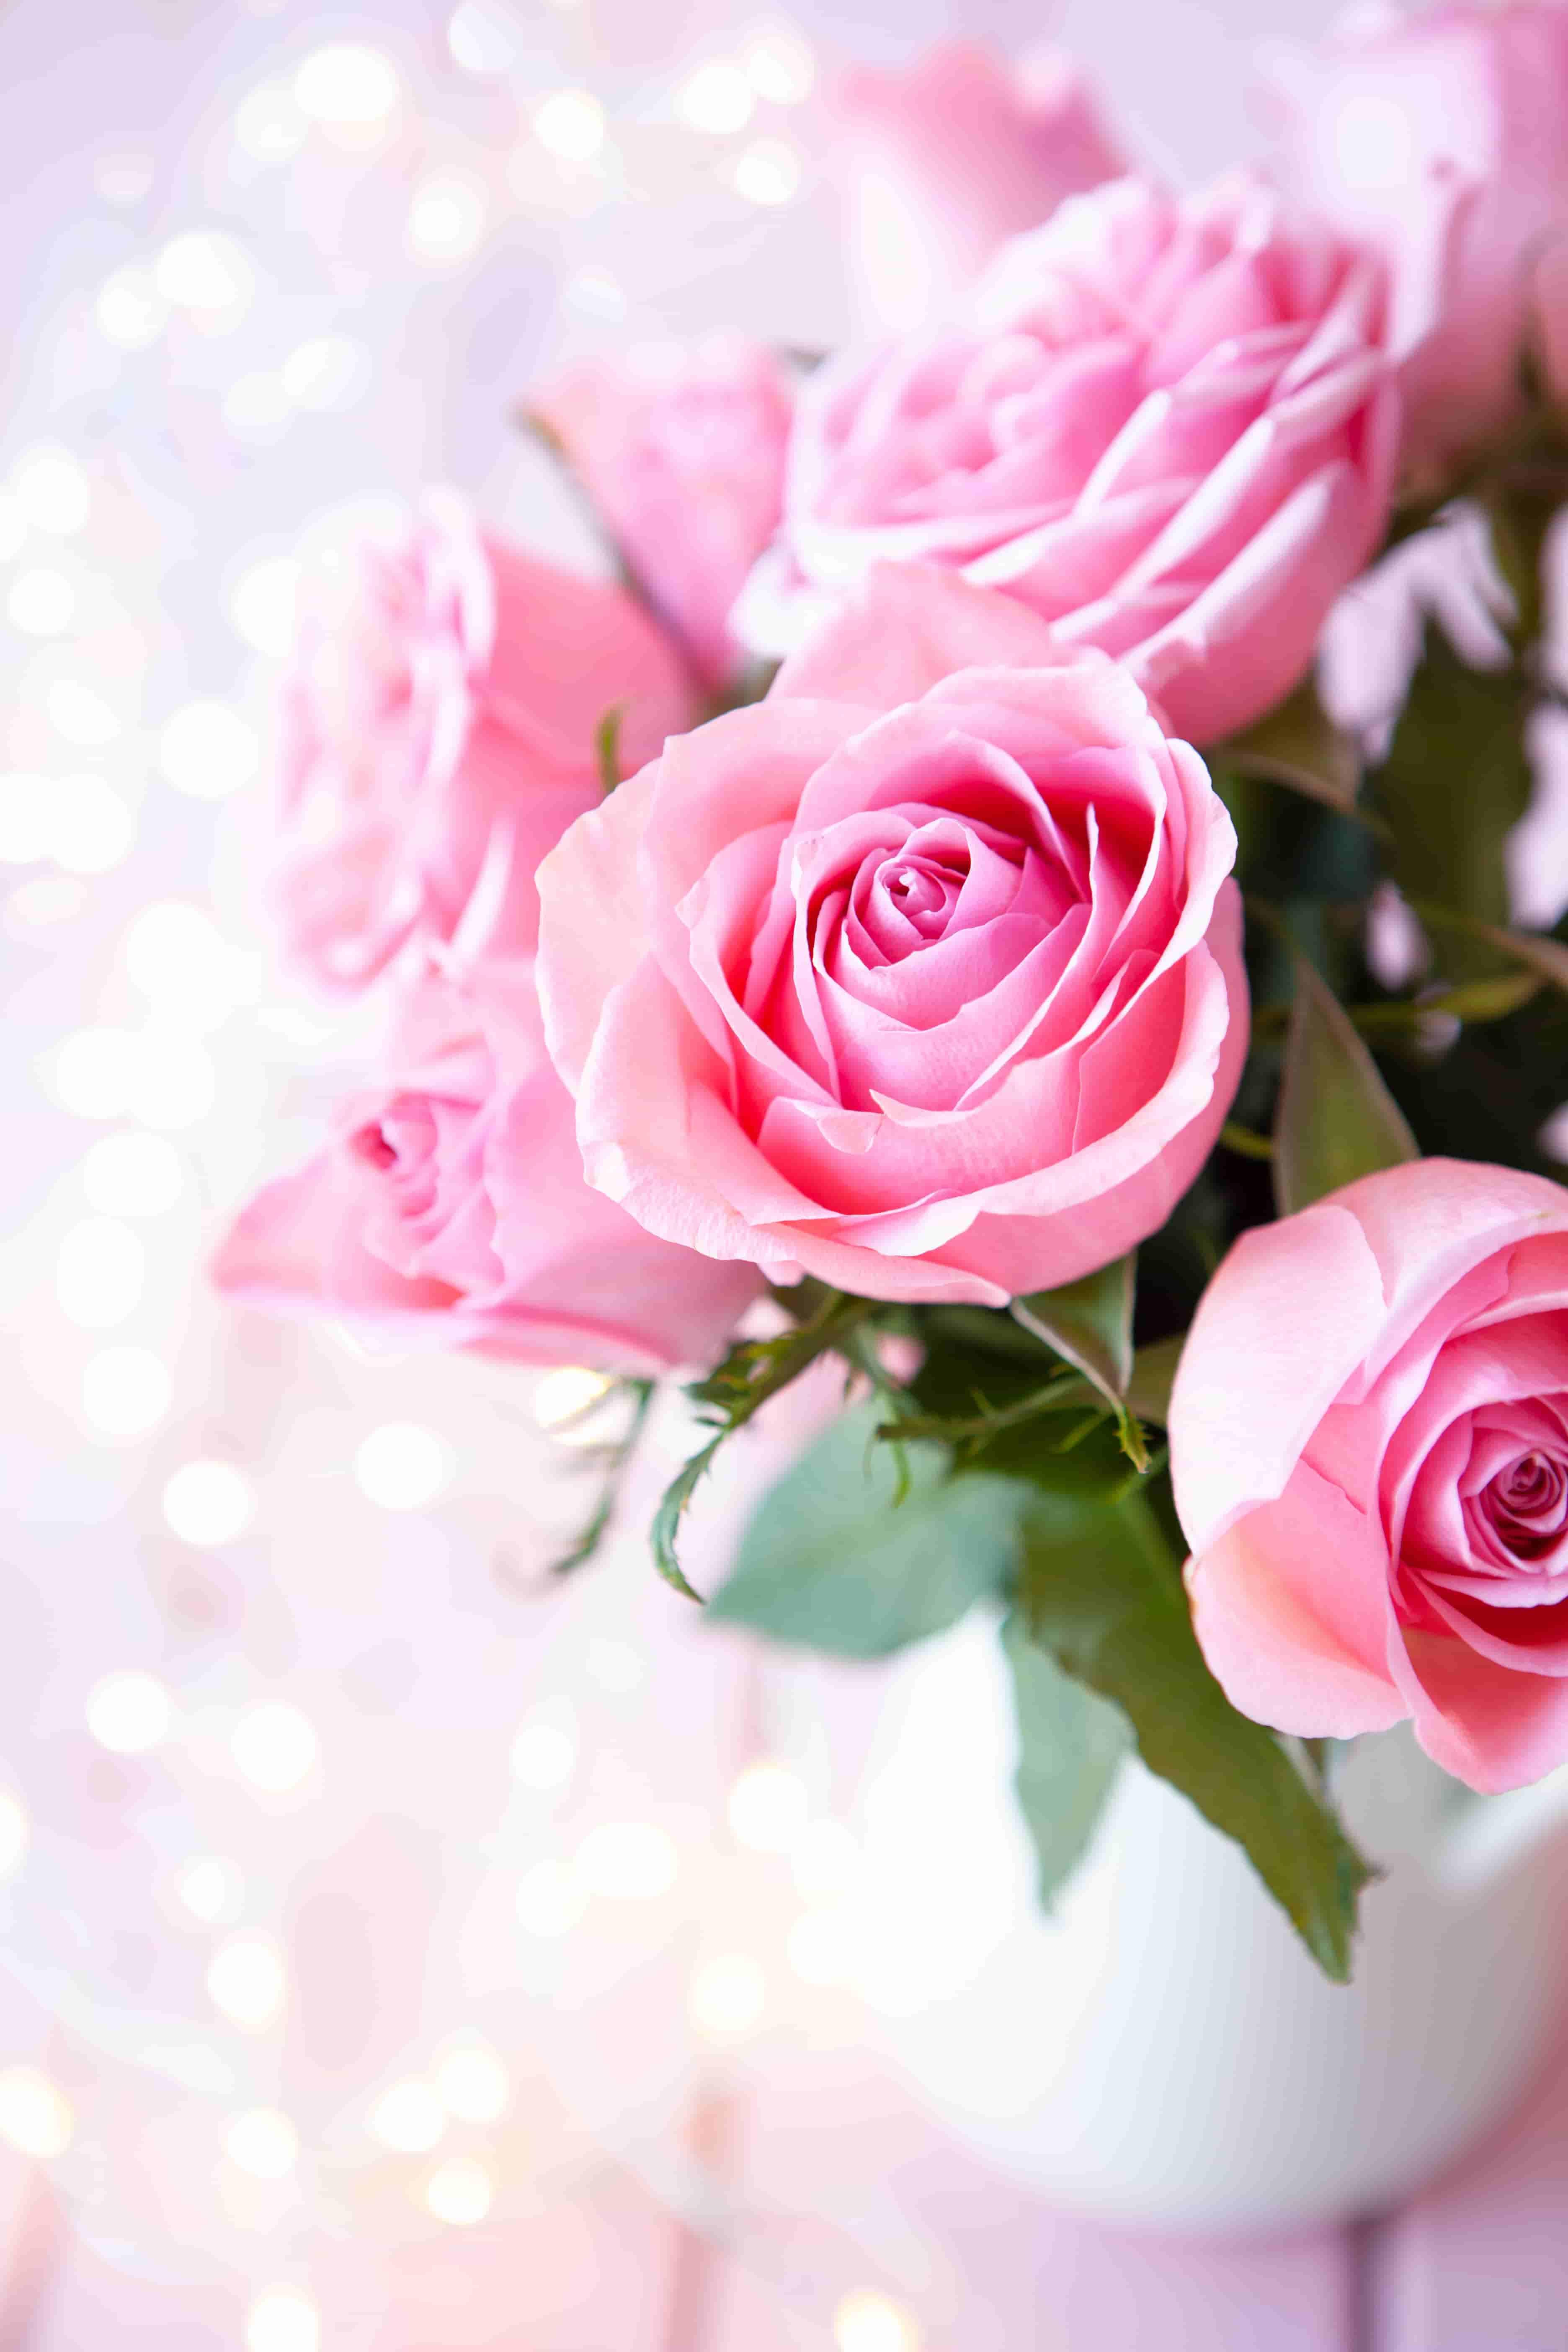 Pink Rose Wallpaper In Hd 3744x5616 Download Hd Wallpaper Wallpapertip